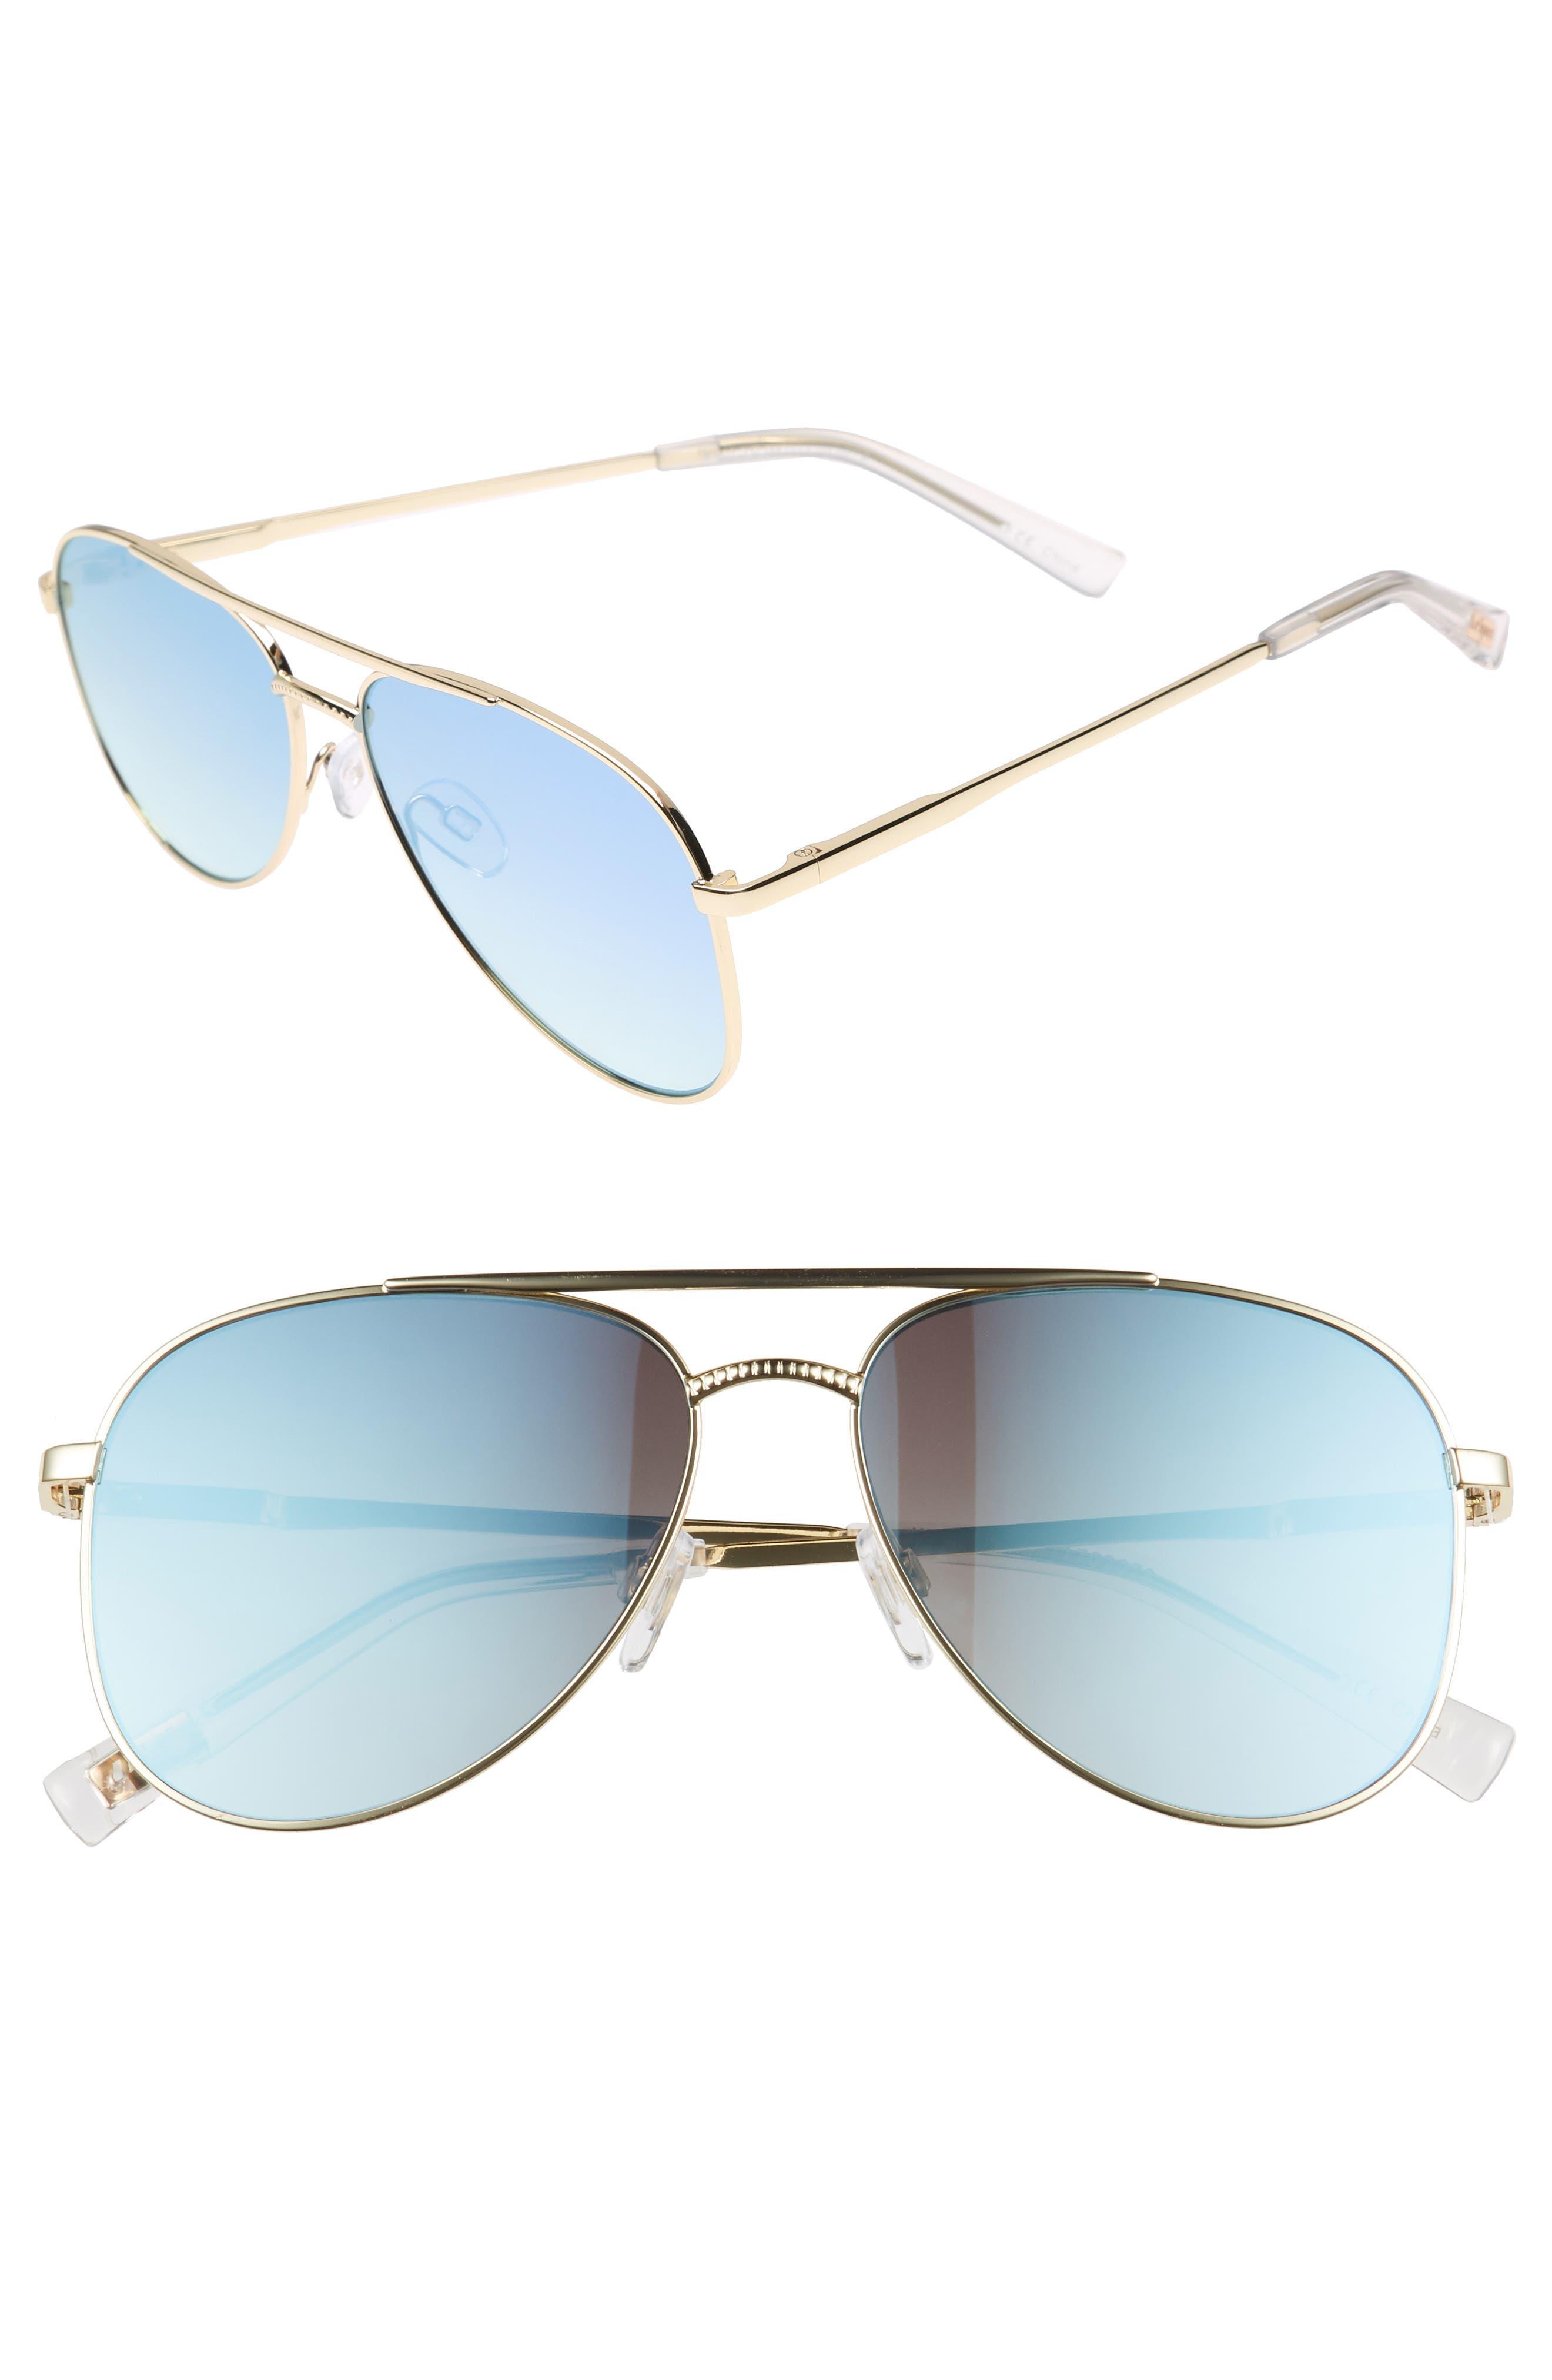 Kingdom 57mm Aviator Sunglasses,                             Main thumbnail 1, color,                             Bright Gold